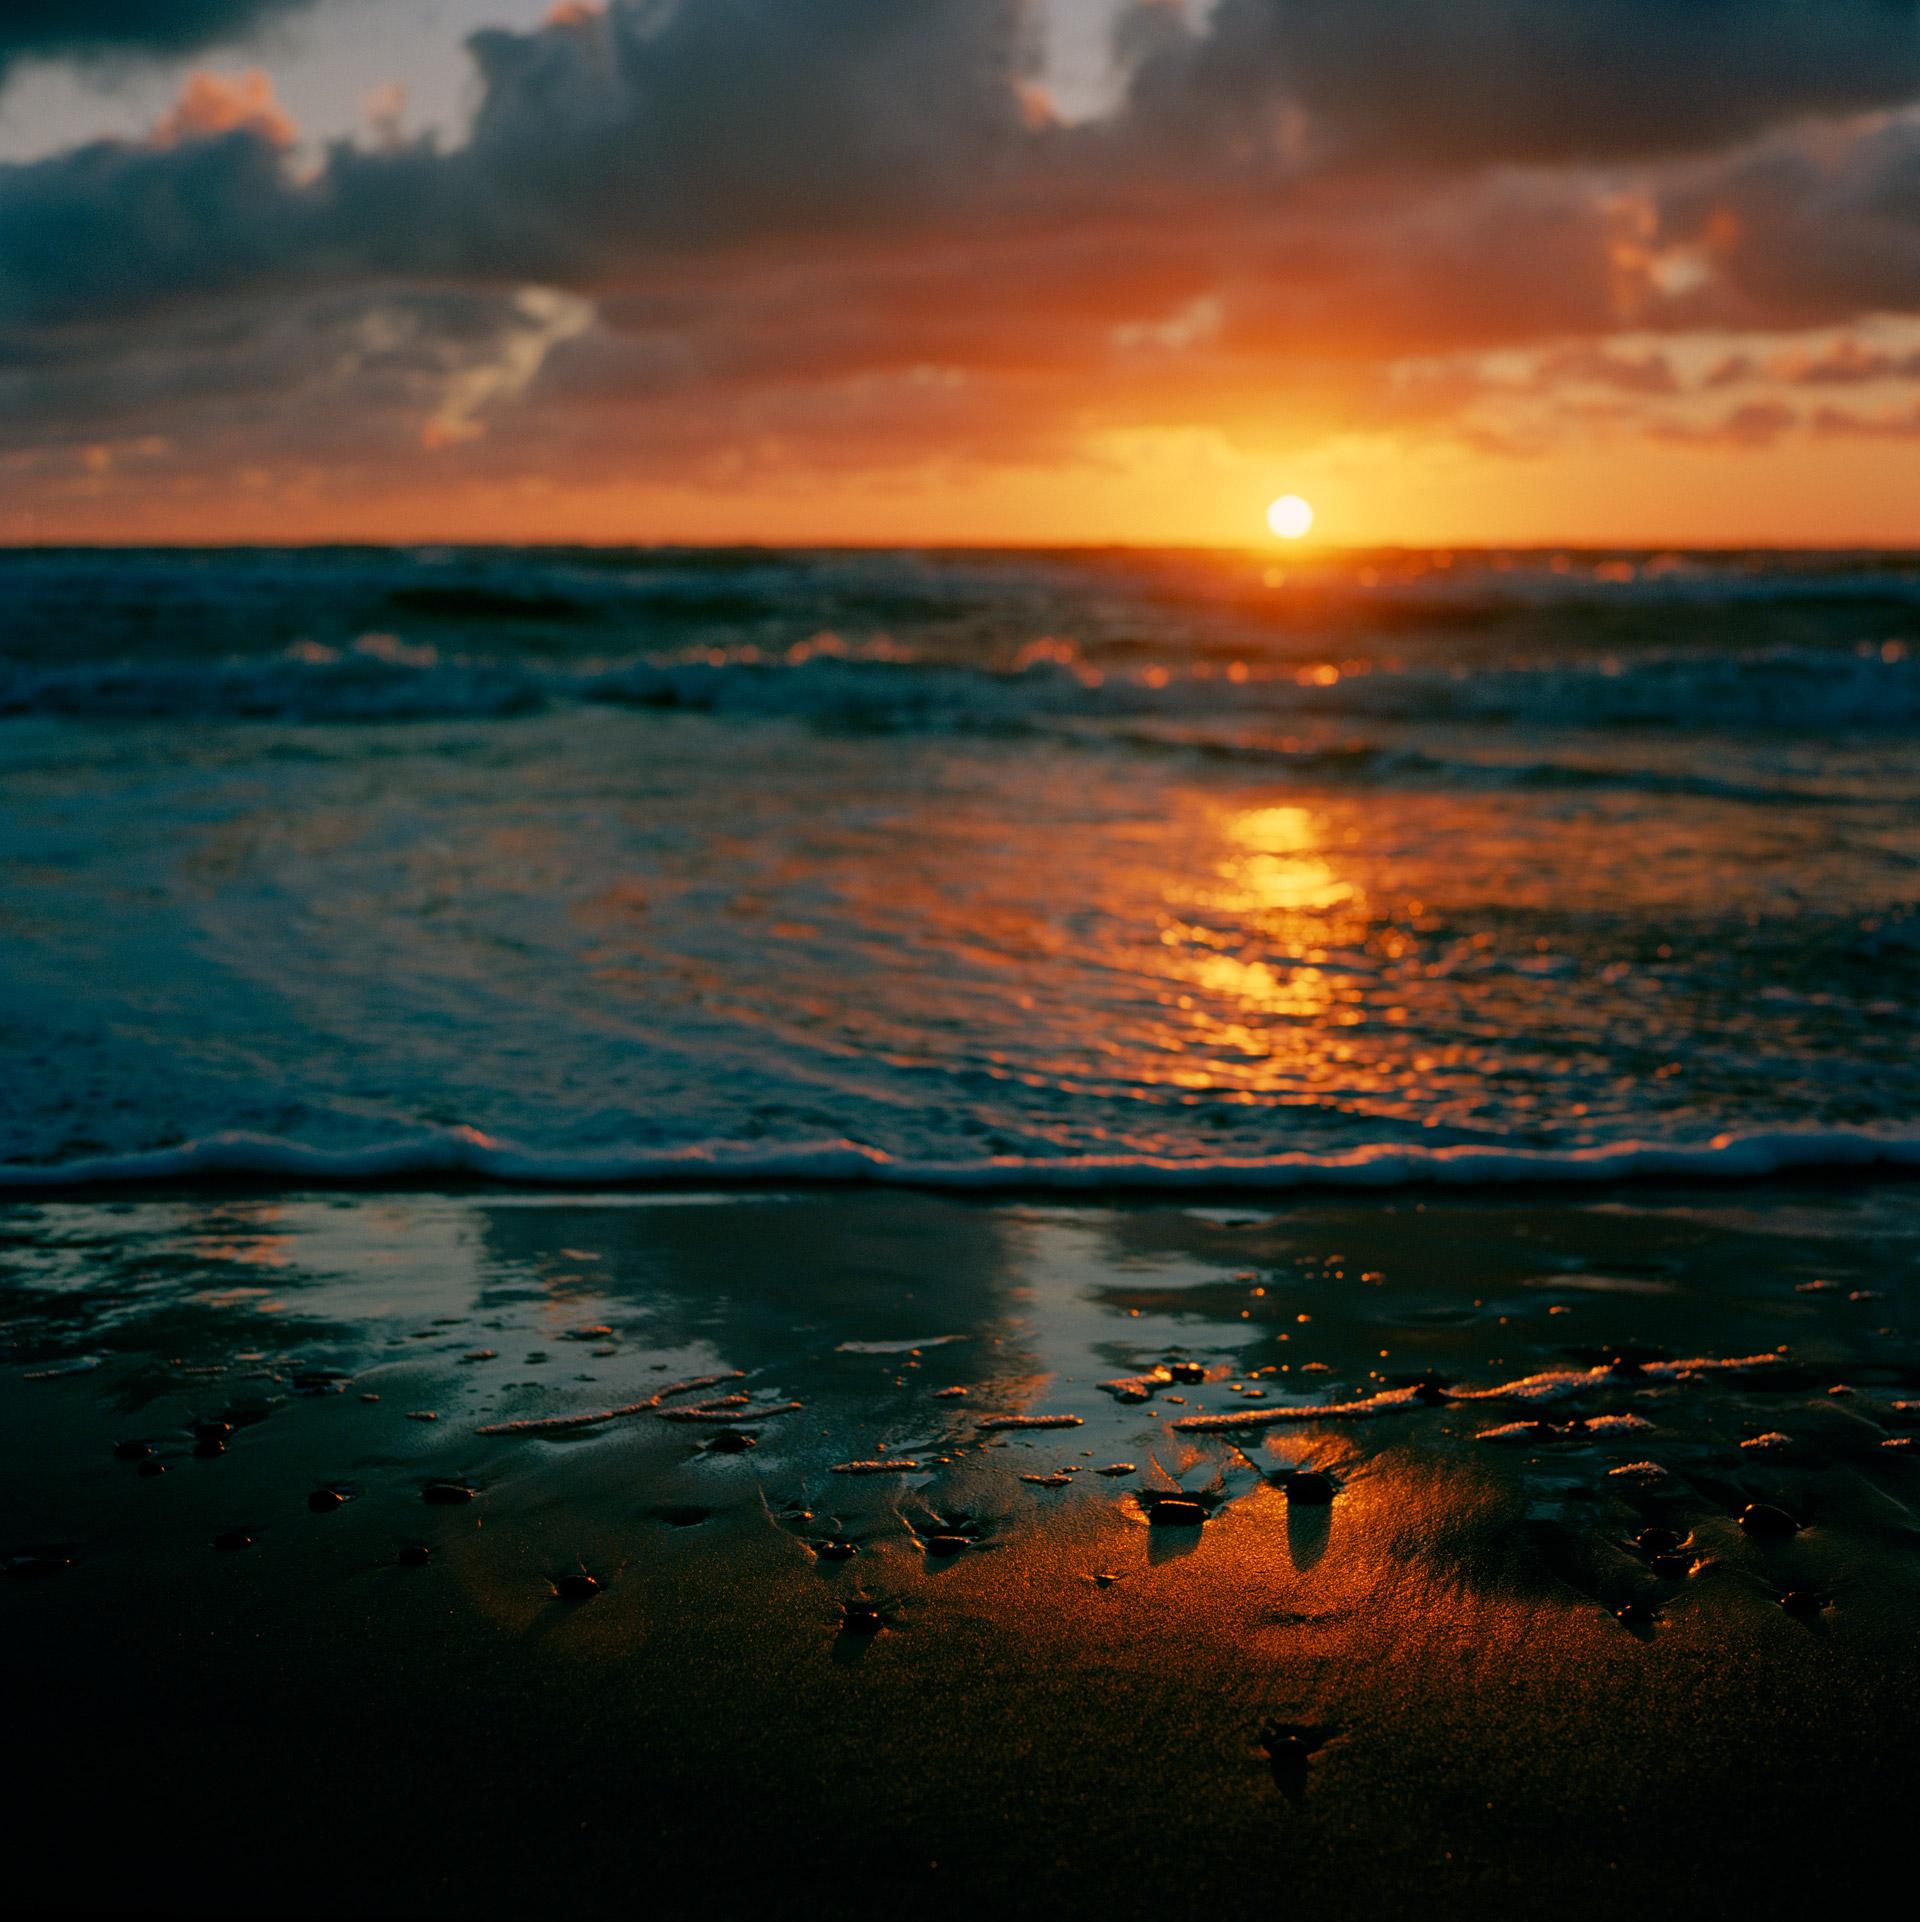 Sunset over the North Sea in Kandestederne Denmark